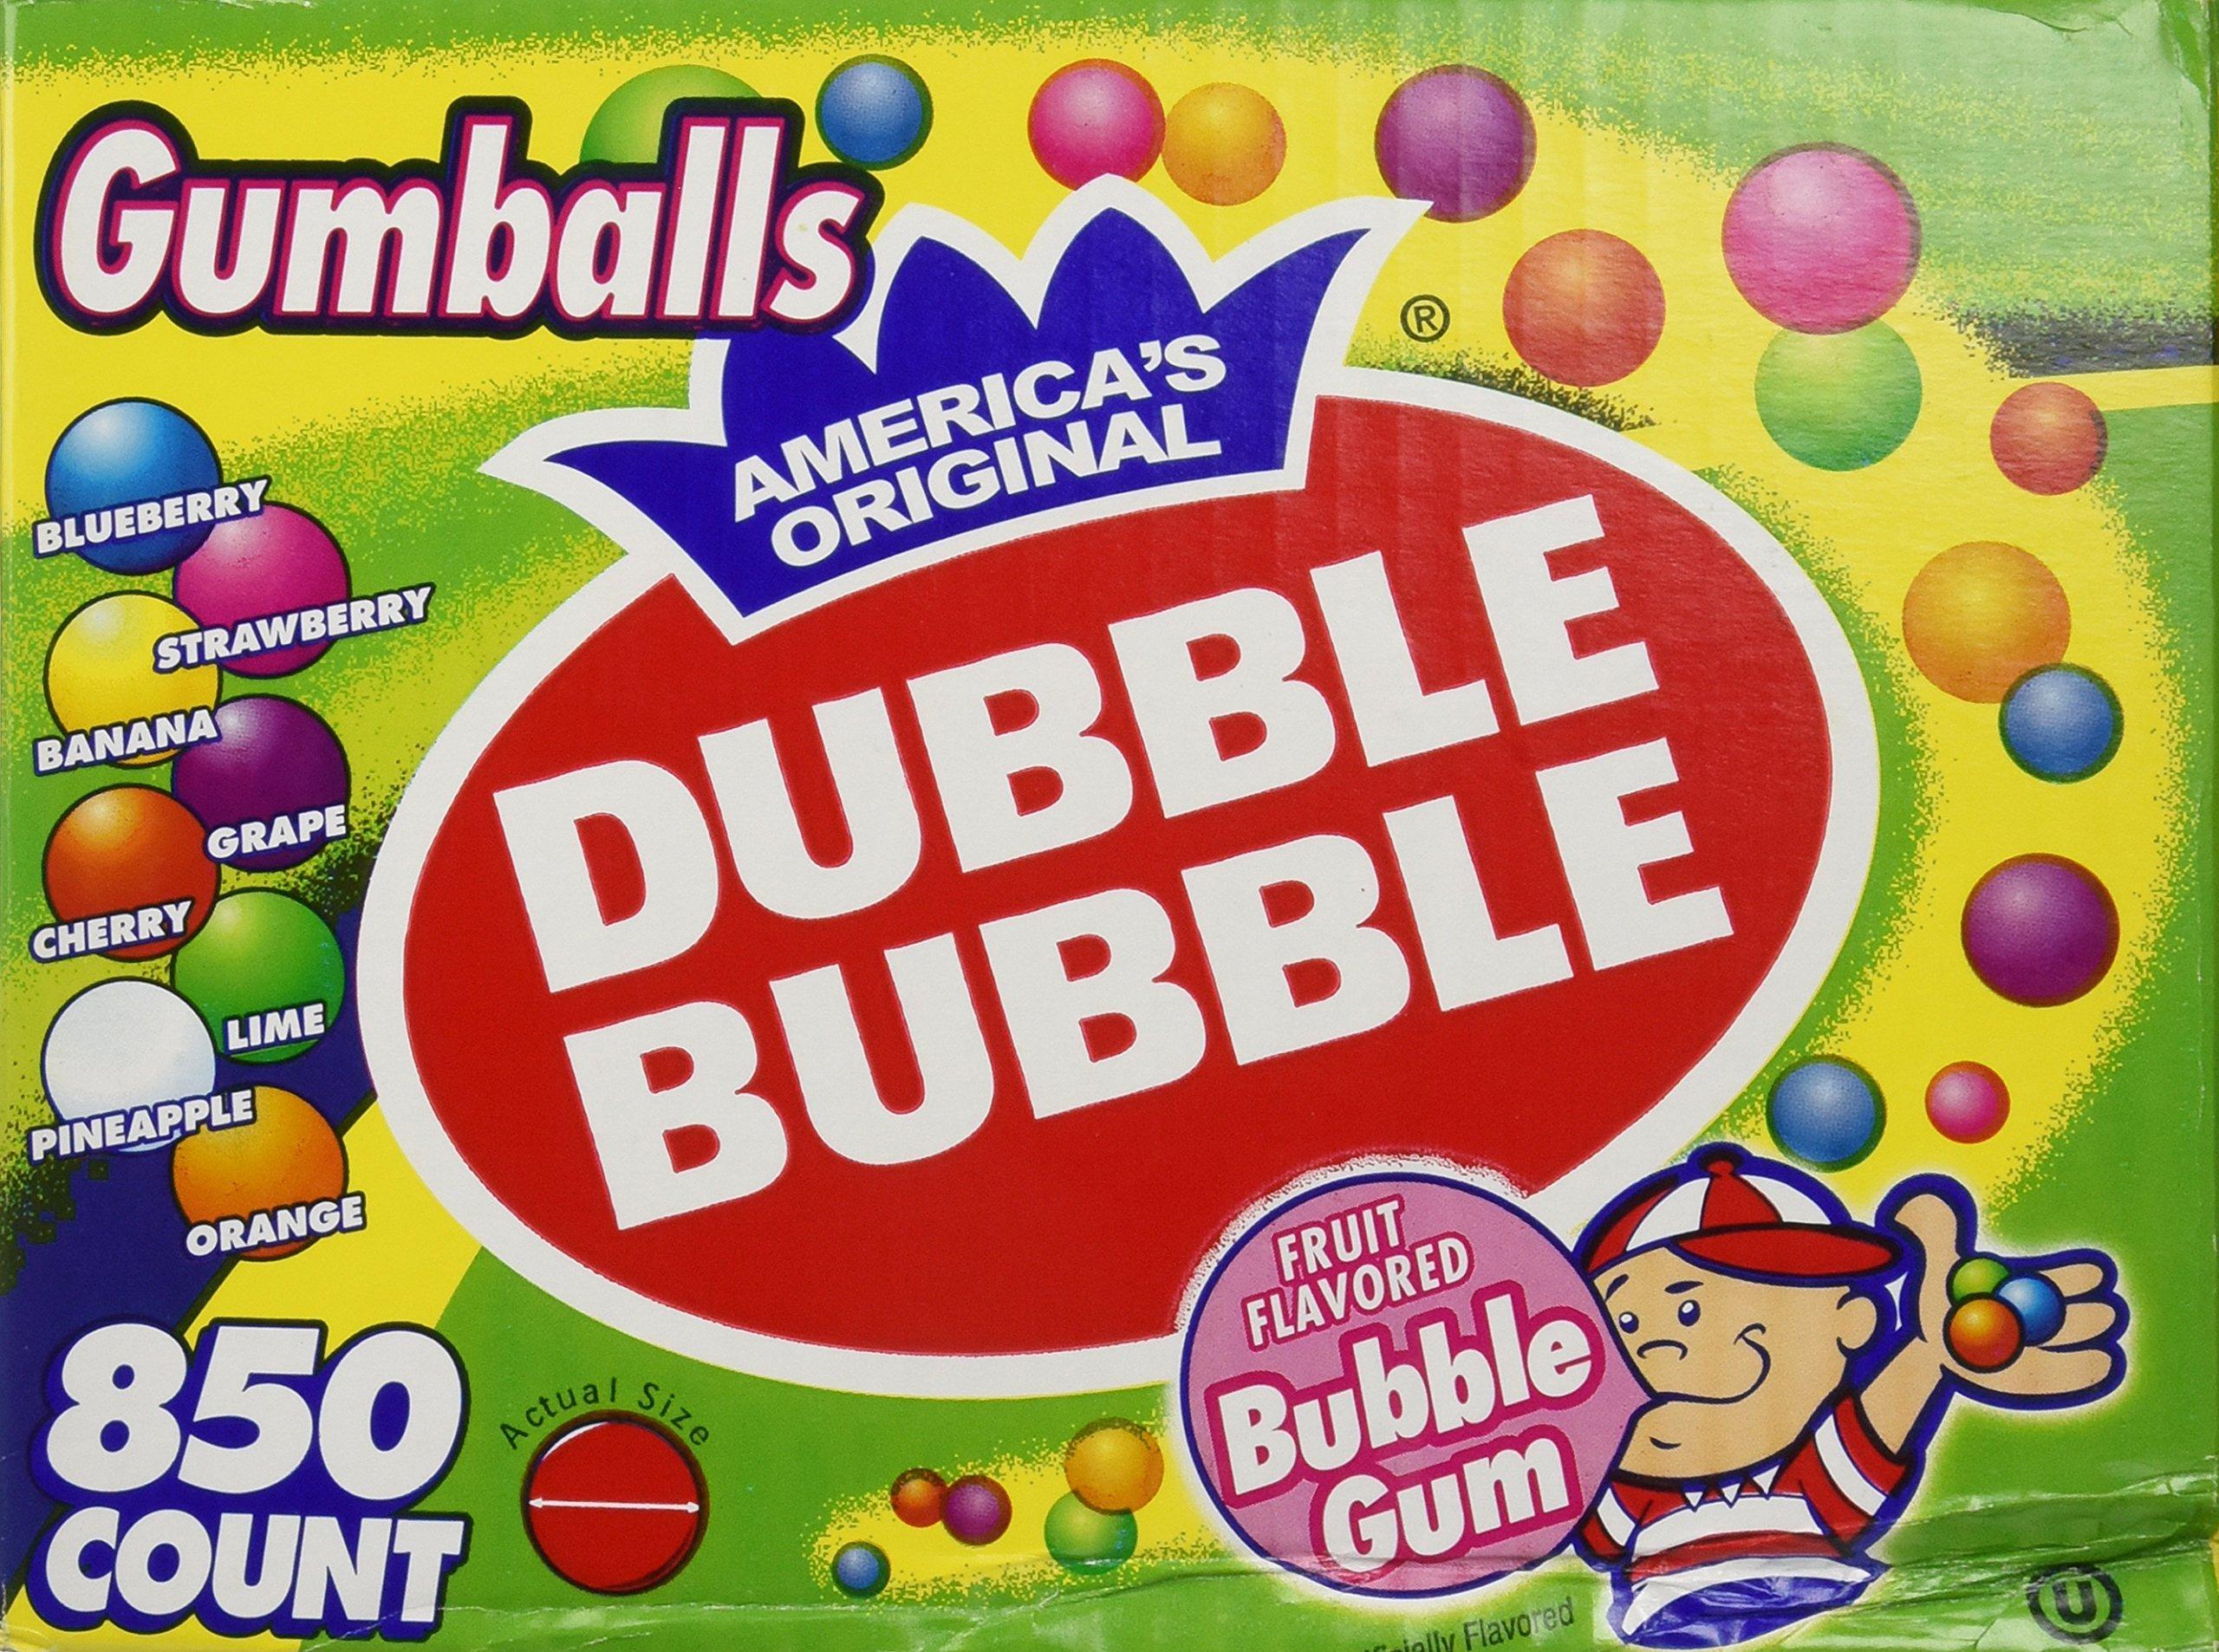 Dubble Bubble-Gumballs 1'' in Diameter Variety Pack, 850 Gumballs by Dubble Bubble